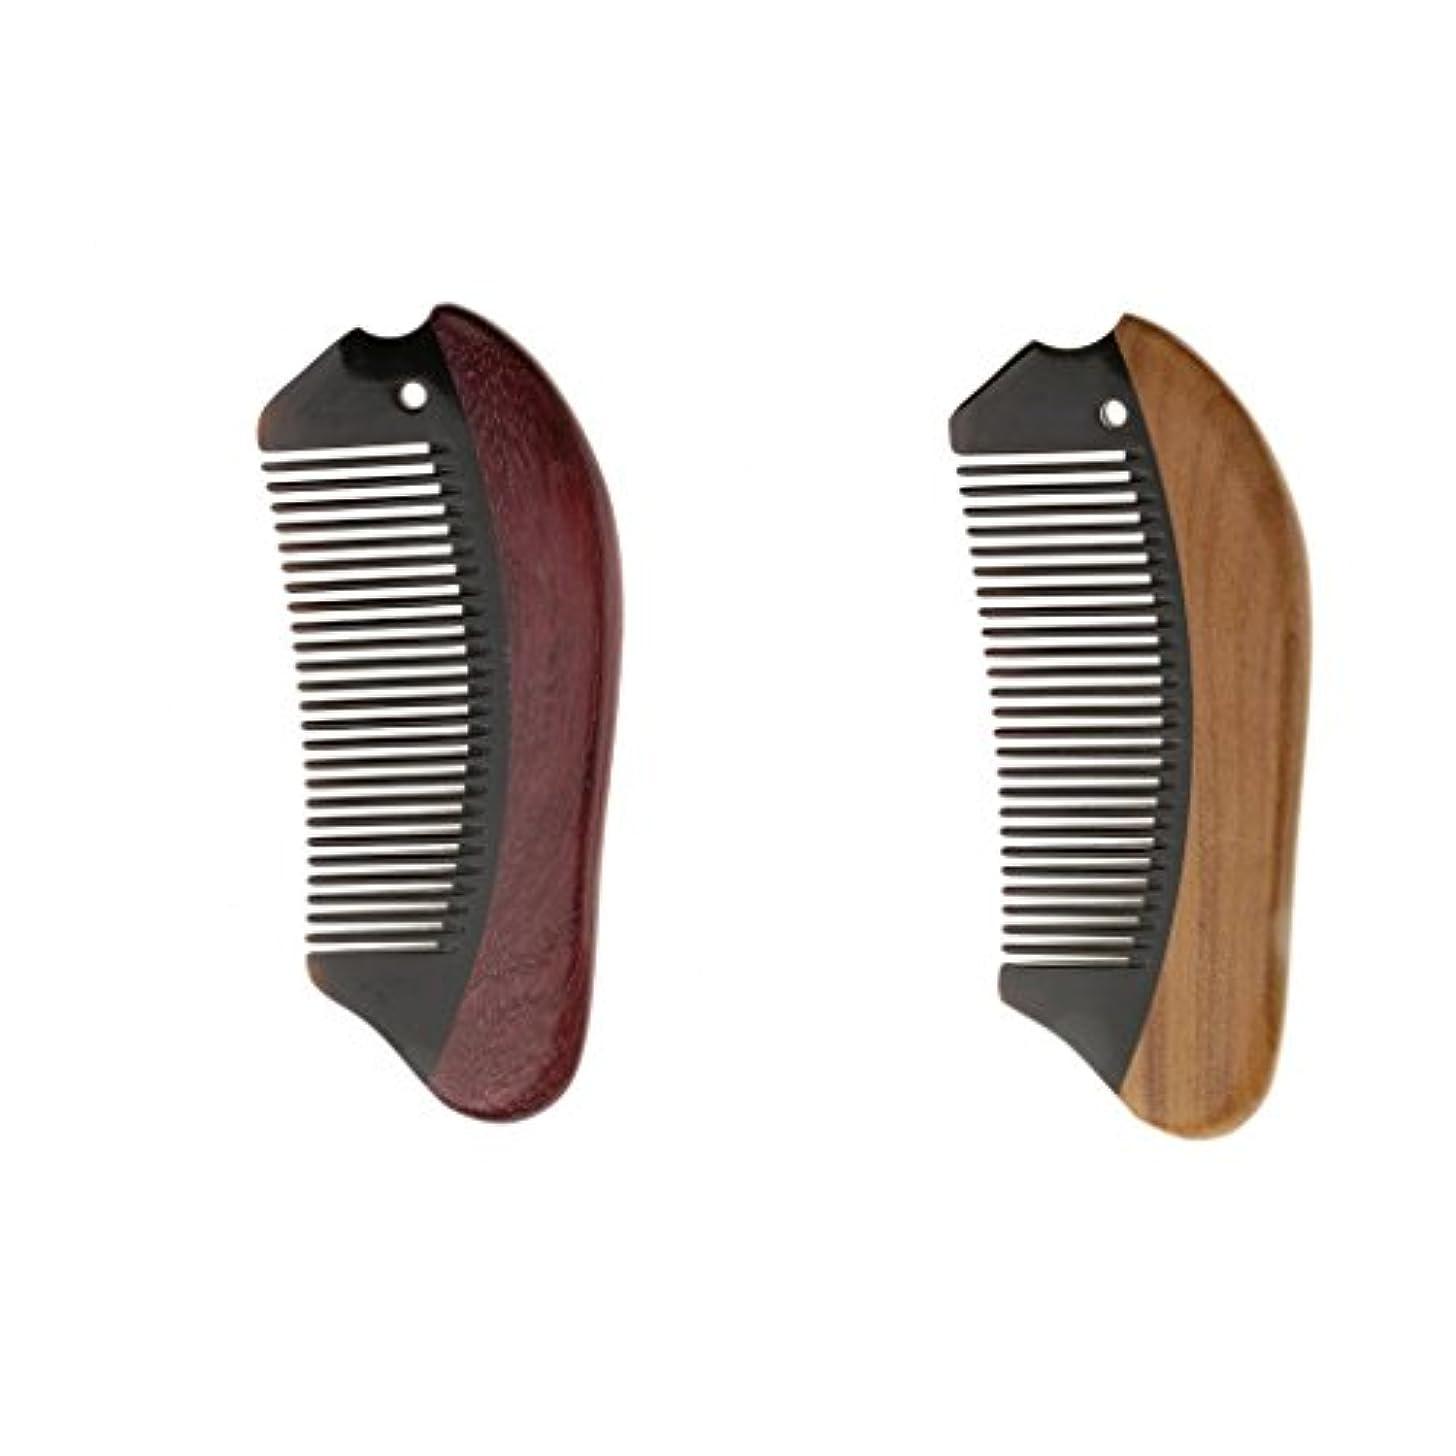 Perfk 2個 木製 櫛 コーム 静電気防止 ウッド マッサージ 高品質